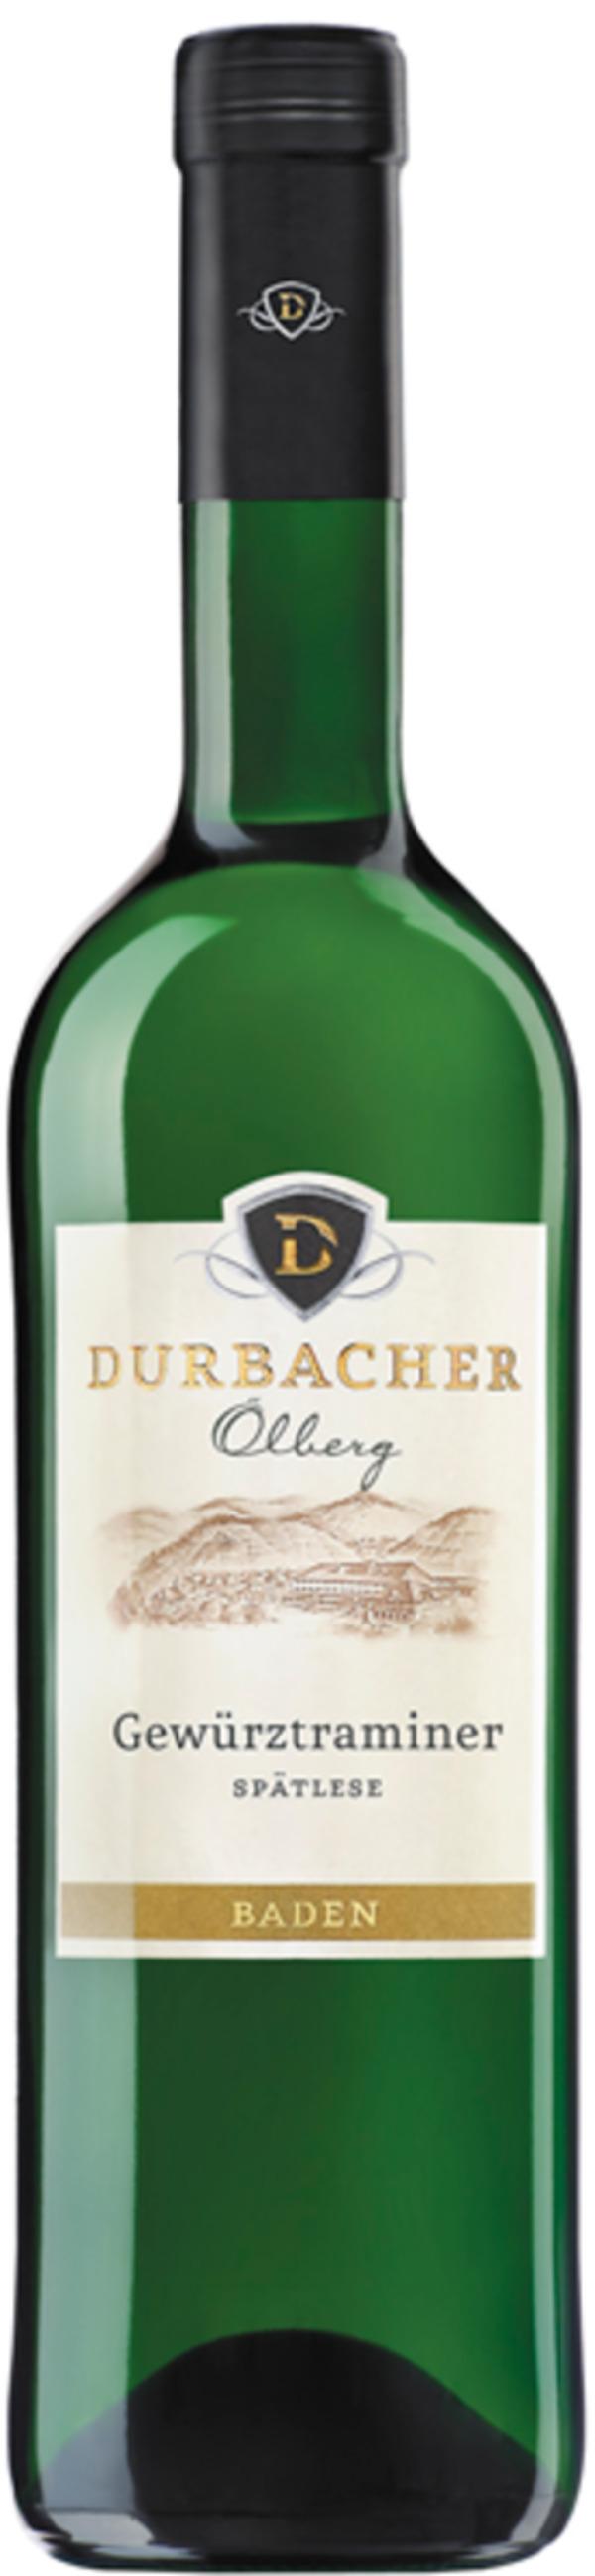 Durbacher Ölberg Gewürztraminer Spätlese 2019 0,75 ltr